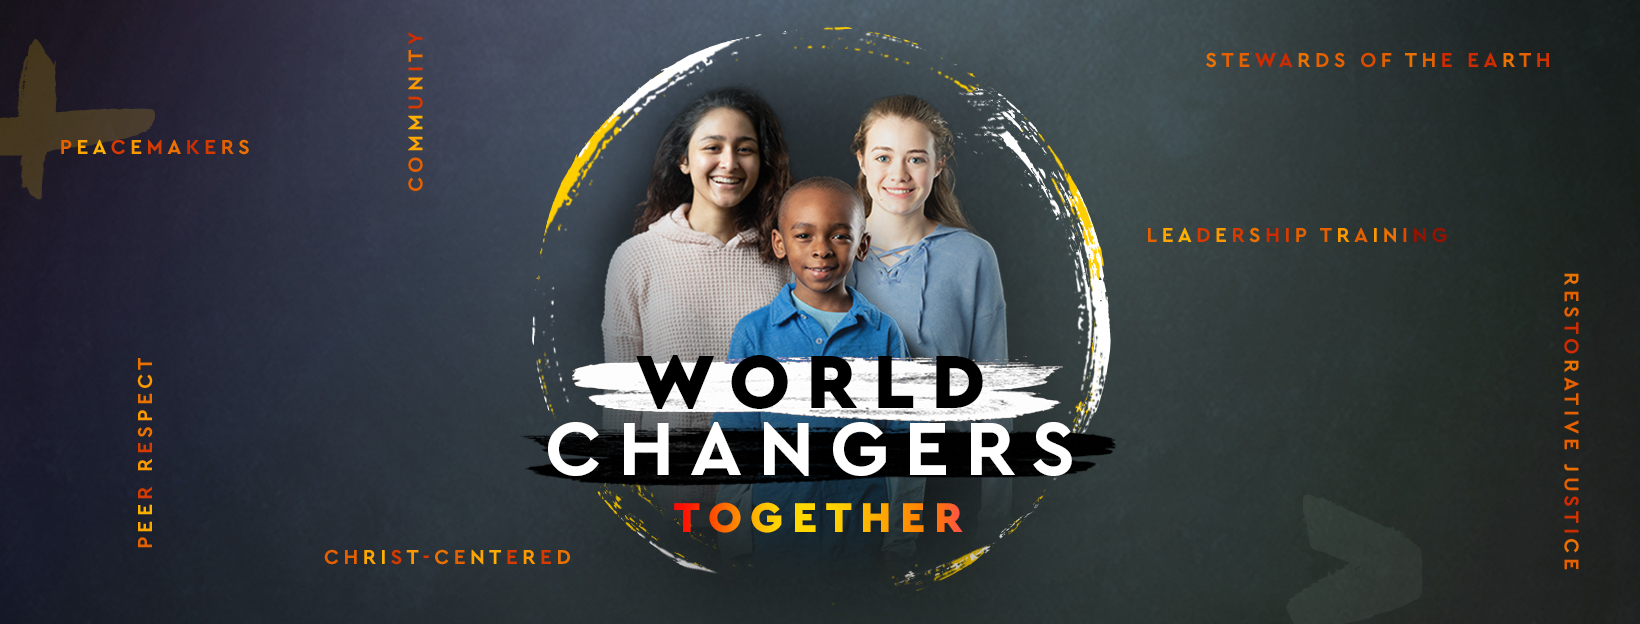 world changers banner